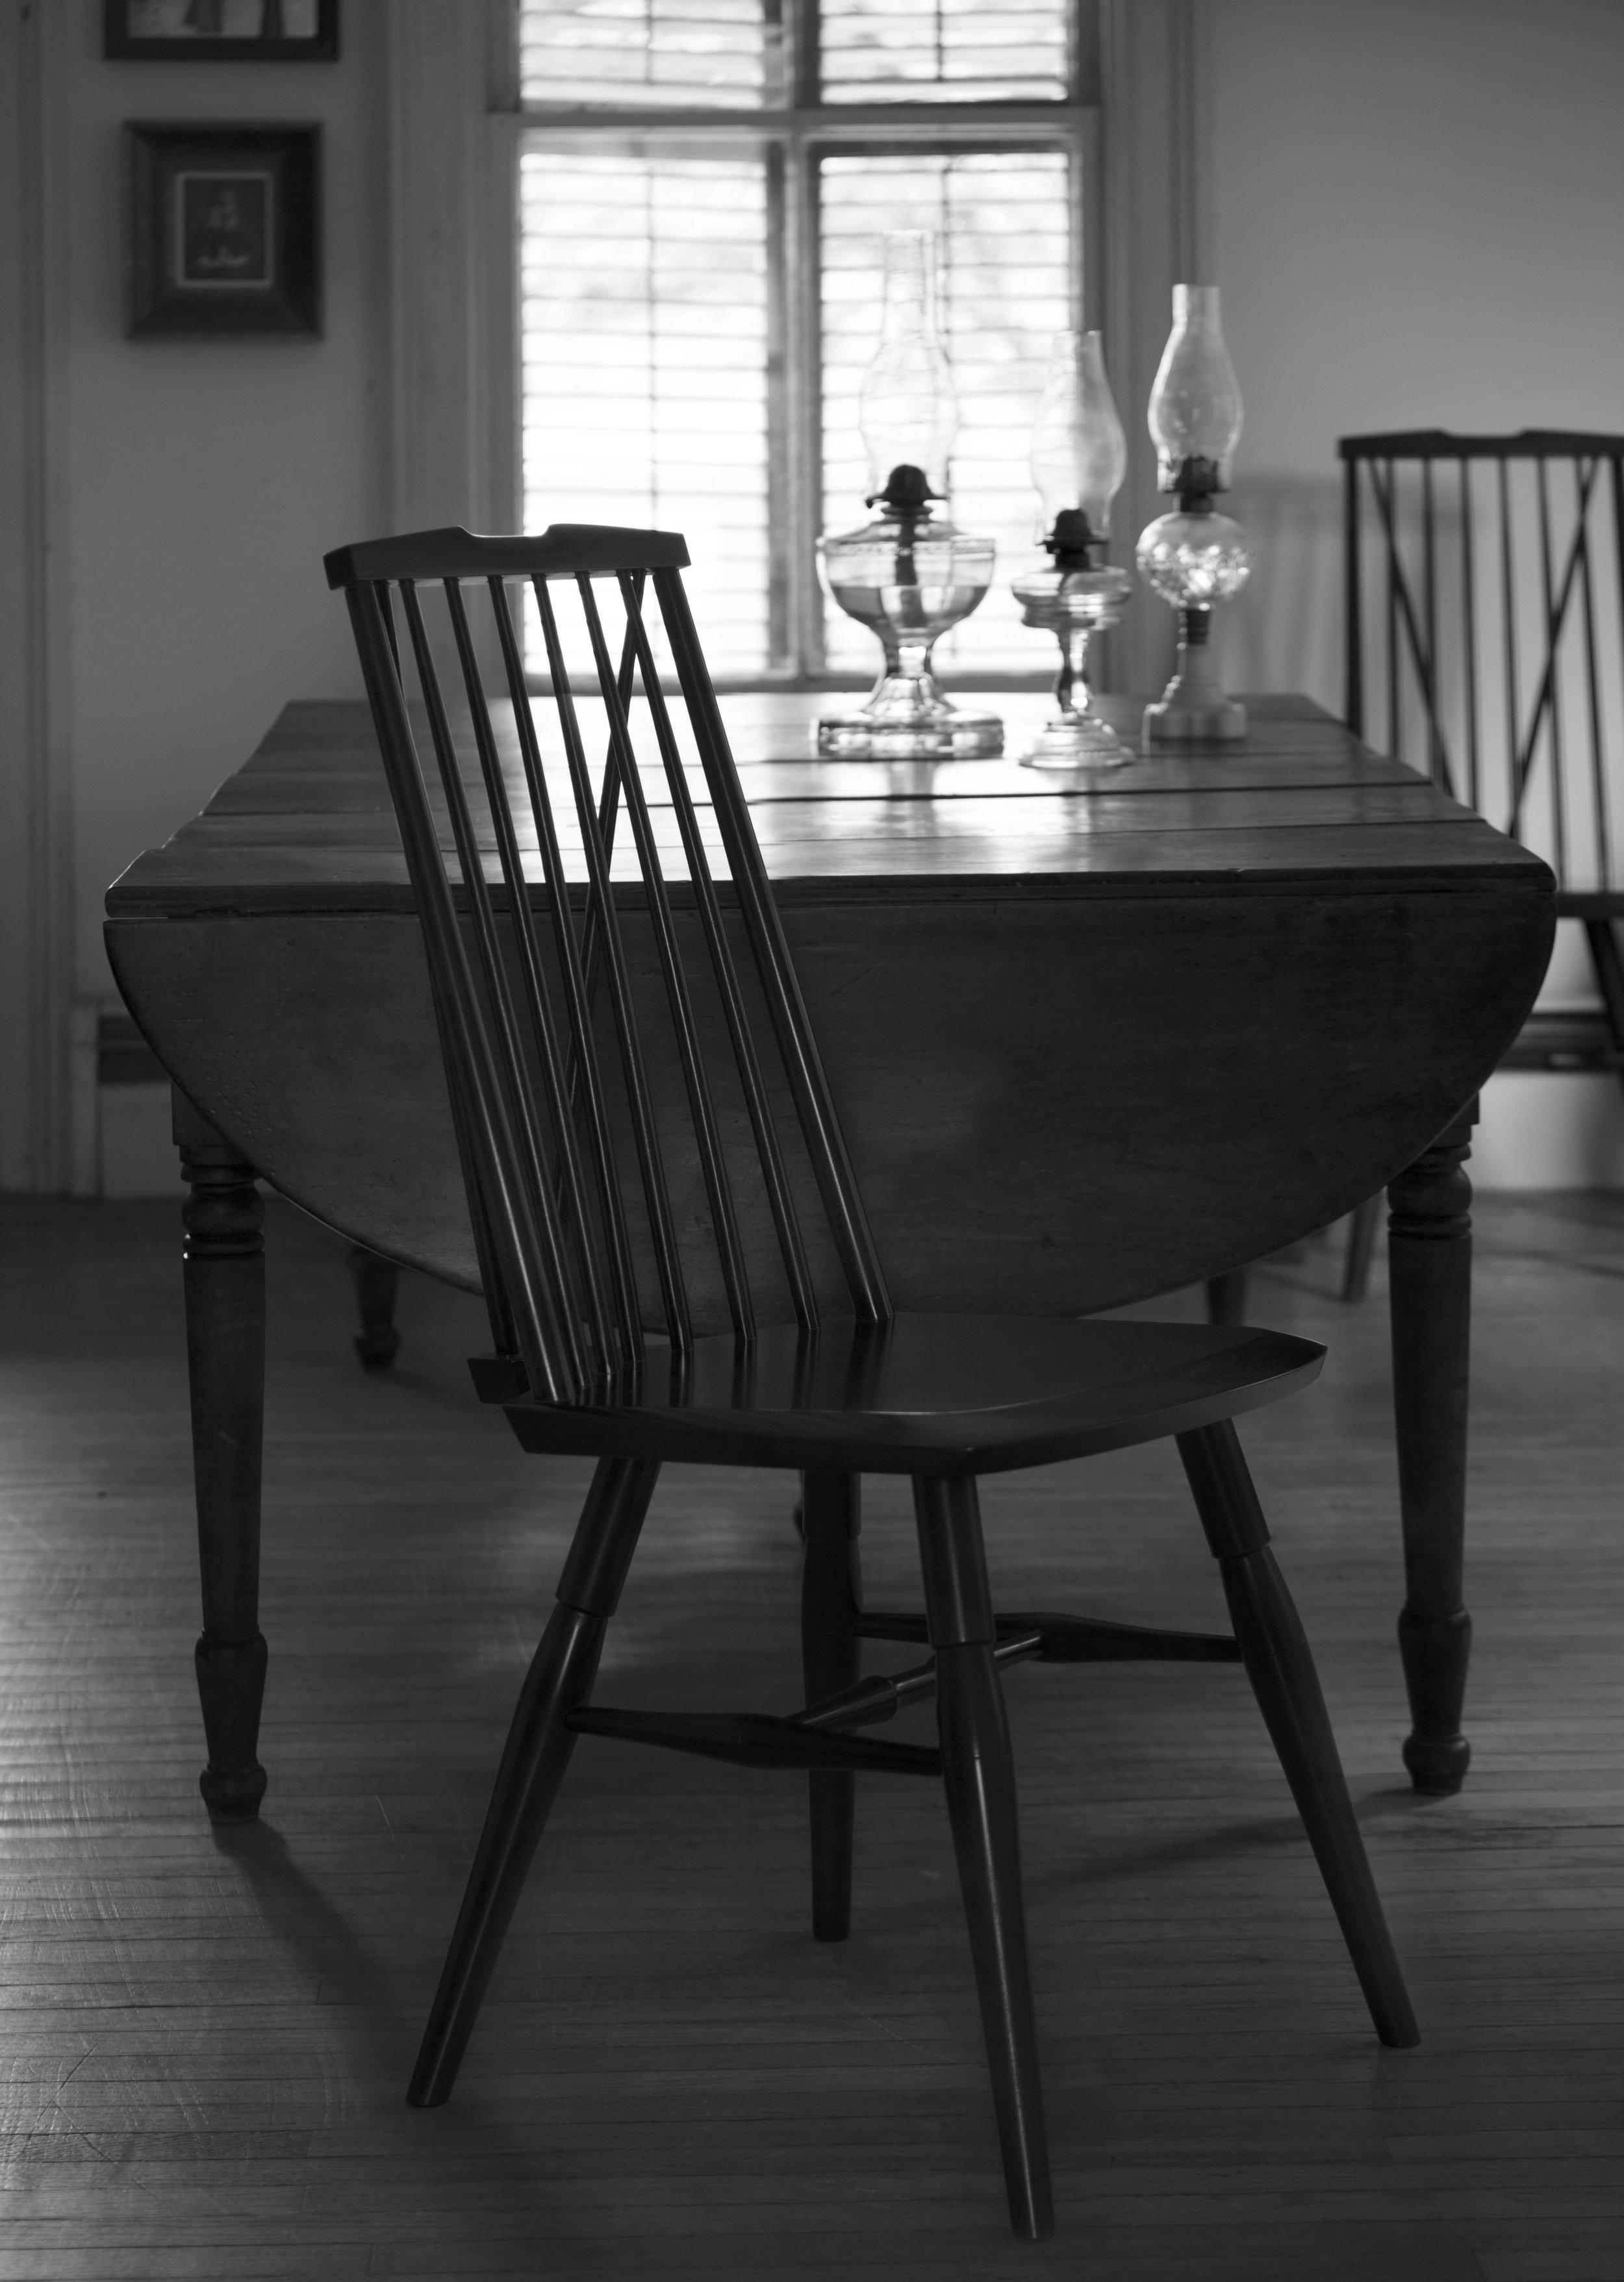 O&G Aquinnah Chair Windsor Modern Contemporary Black Shaker Dining.jpg